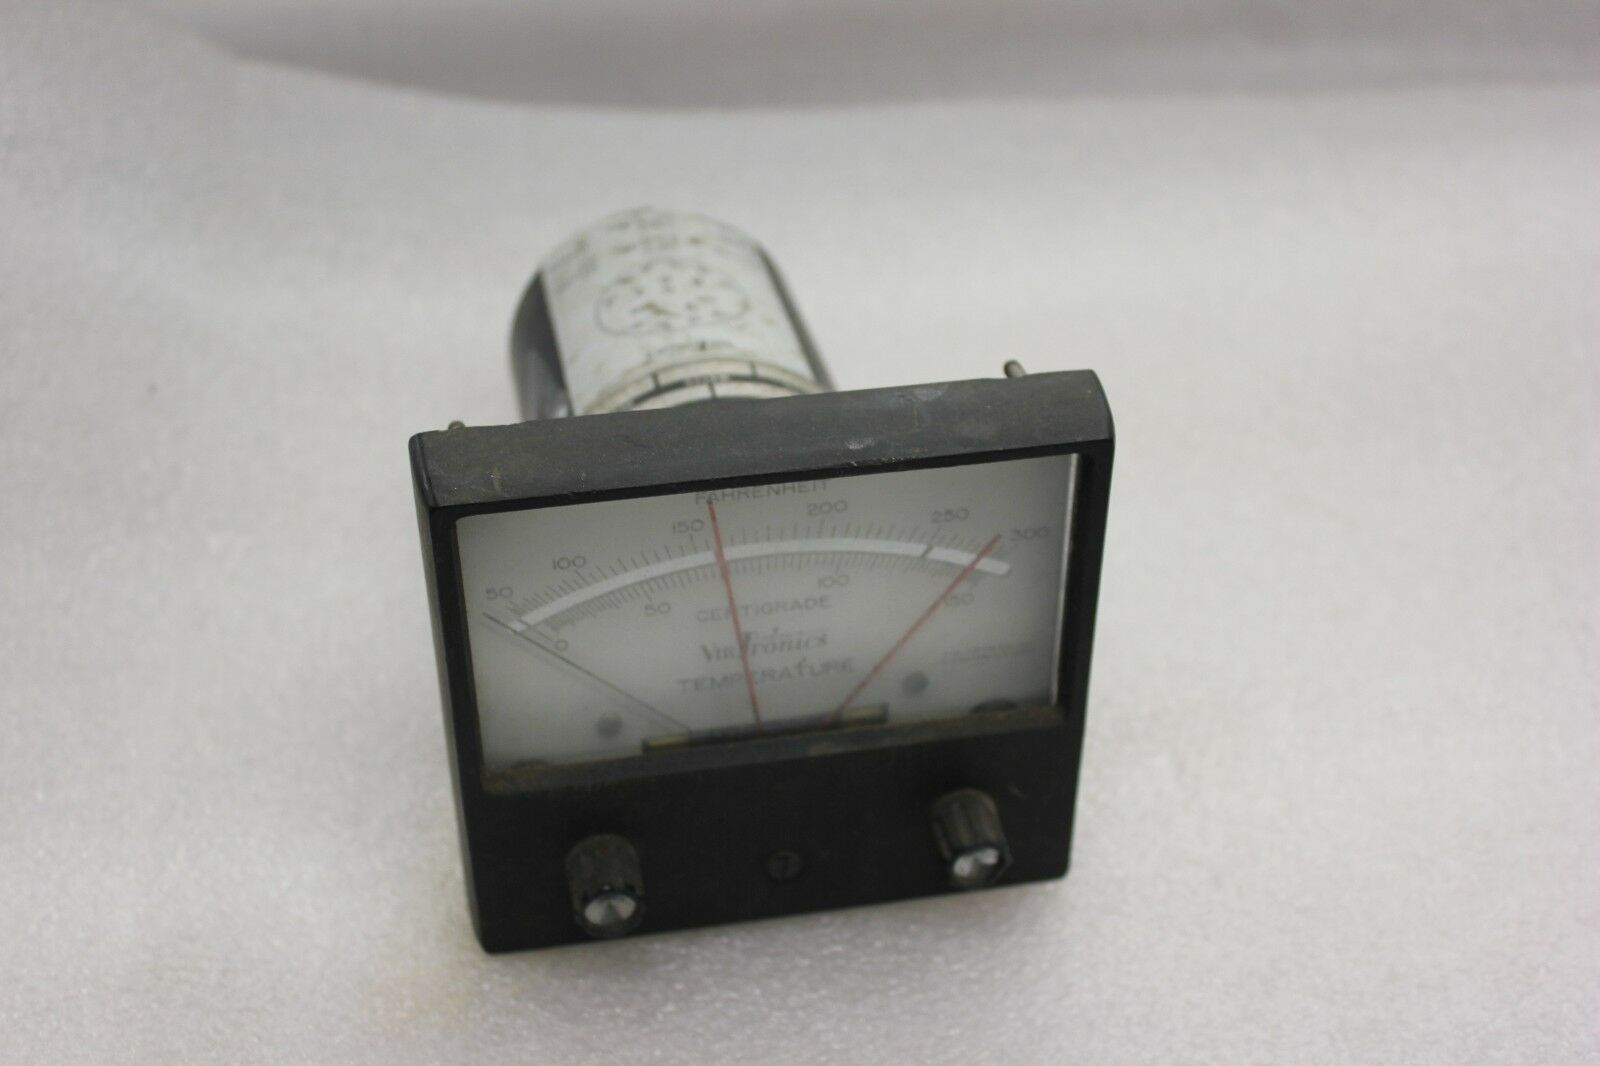 VIRTRONICS Temperature panel meter 0-300F Model  55-MRTC-2S 115V (TS23)